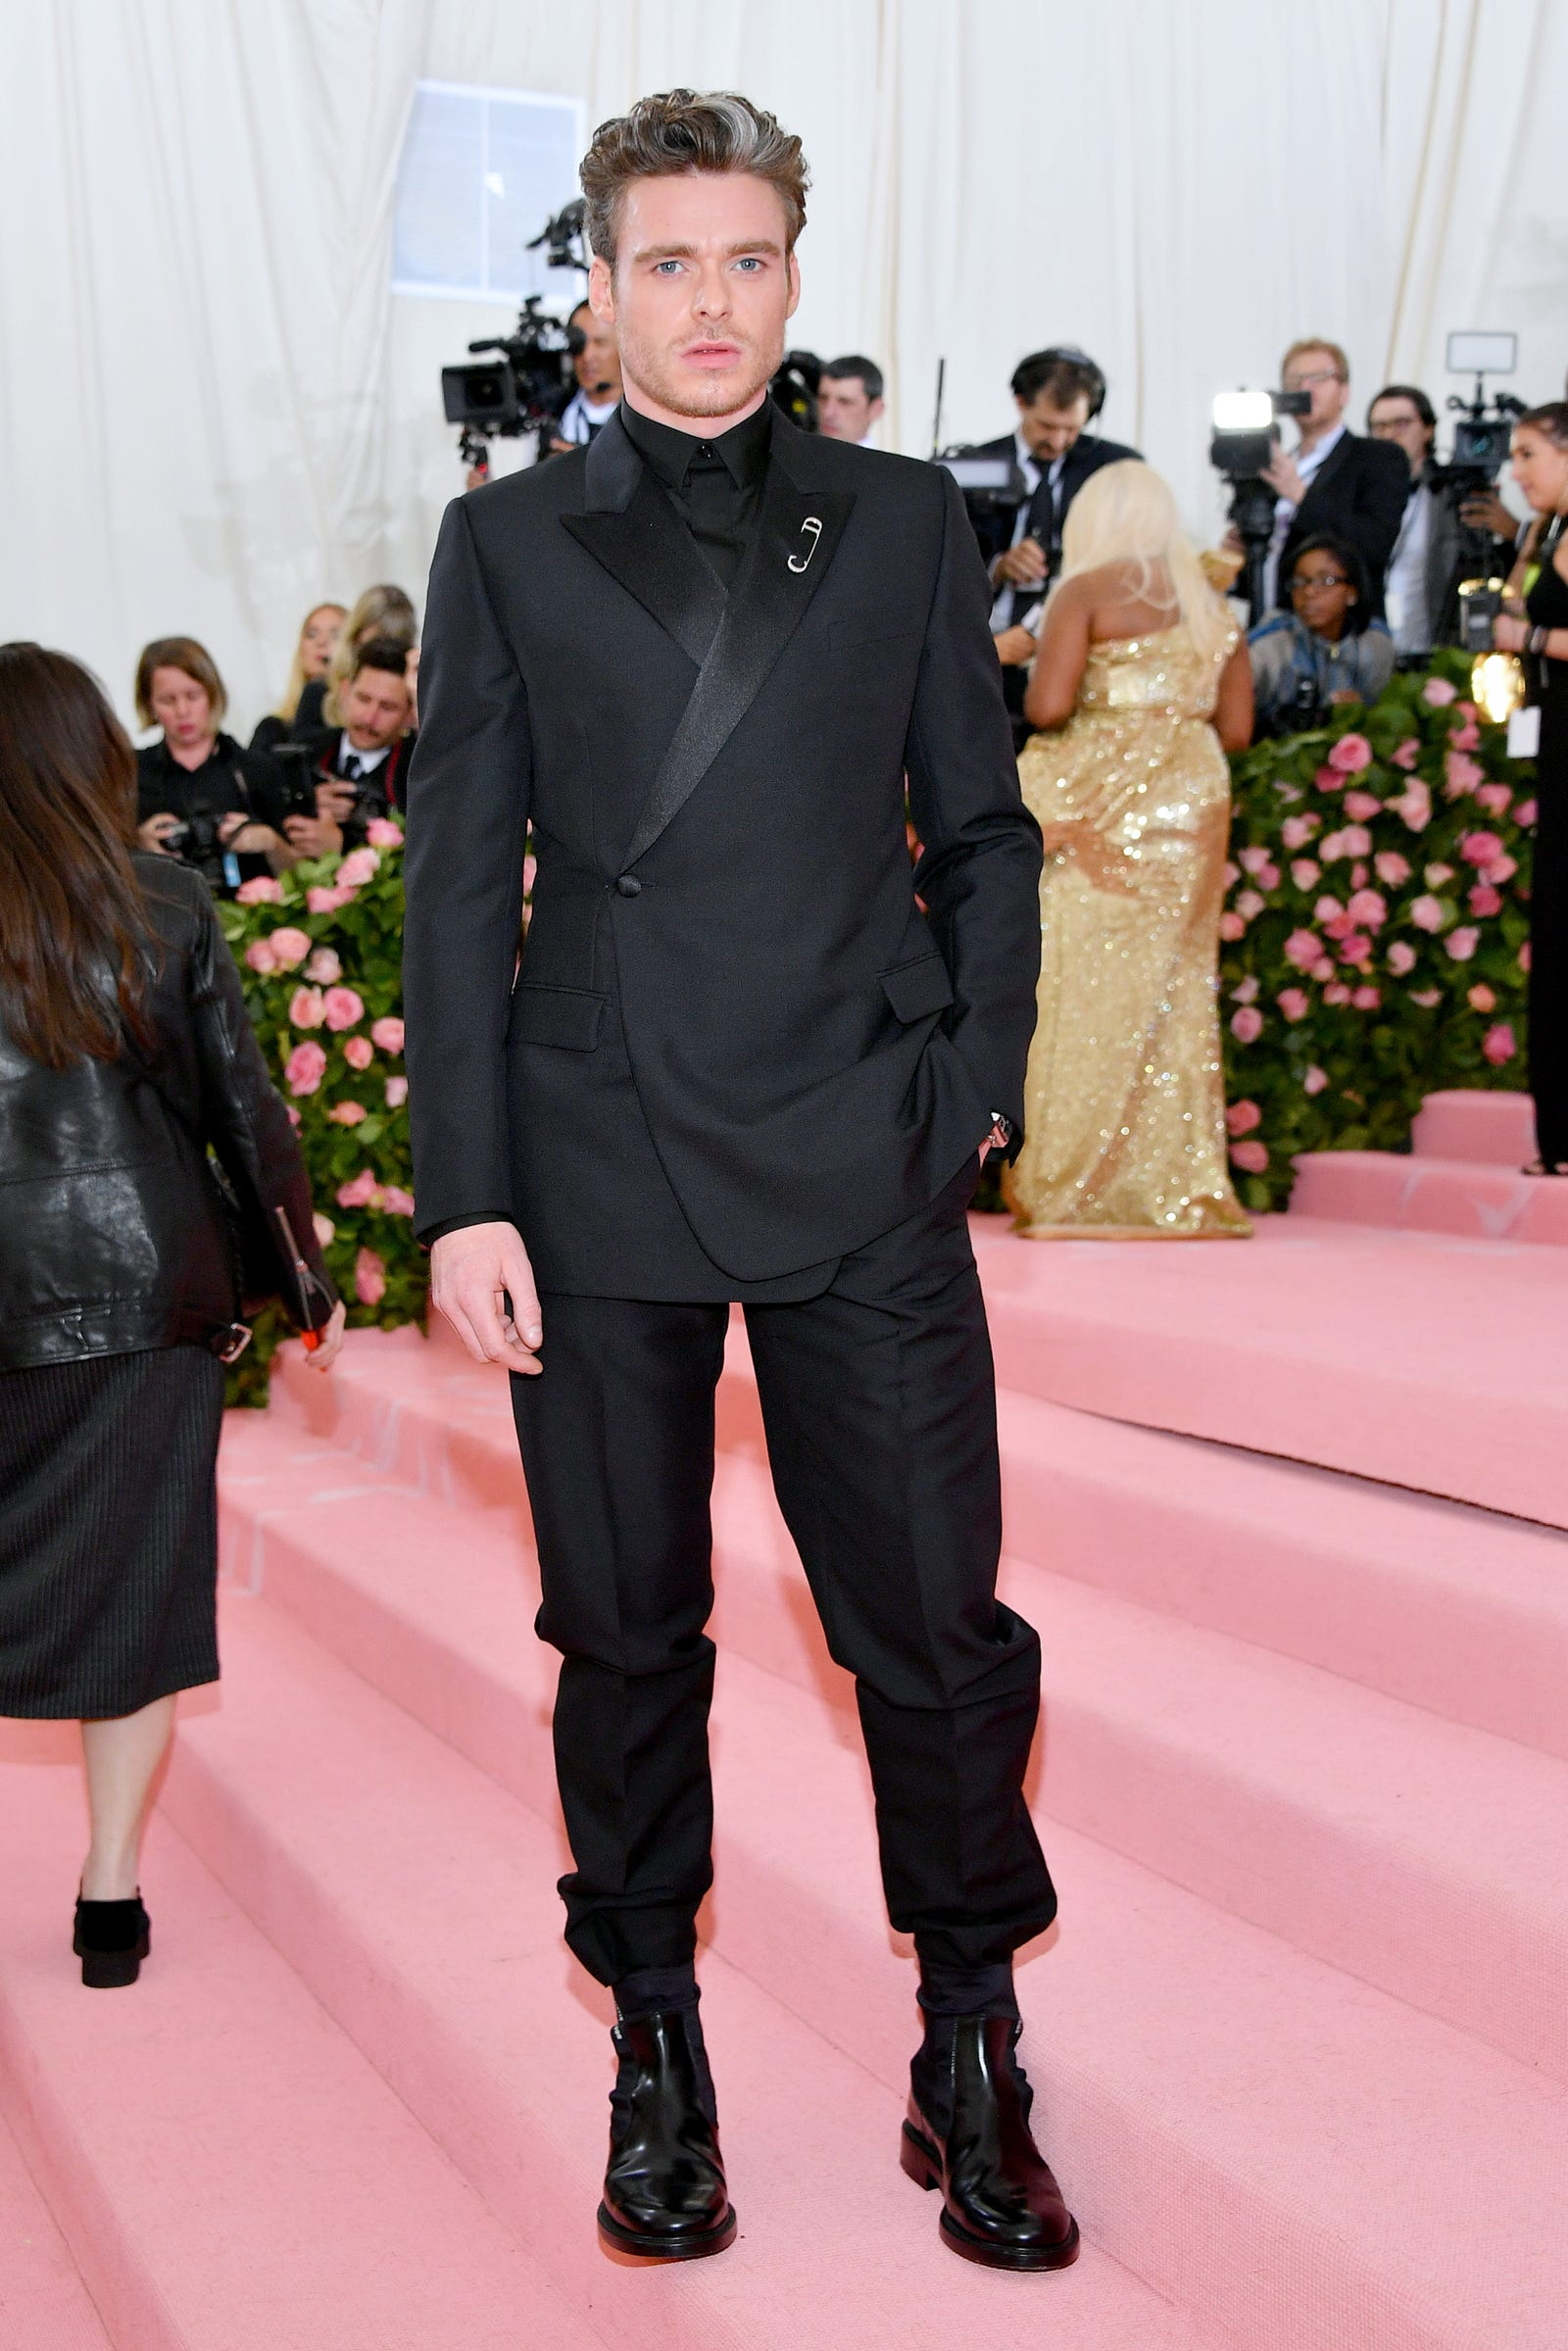 Richard Madden at the Met Gala 2019